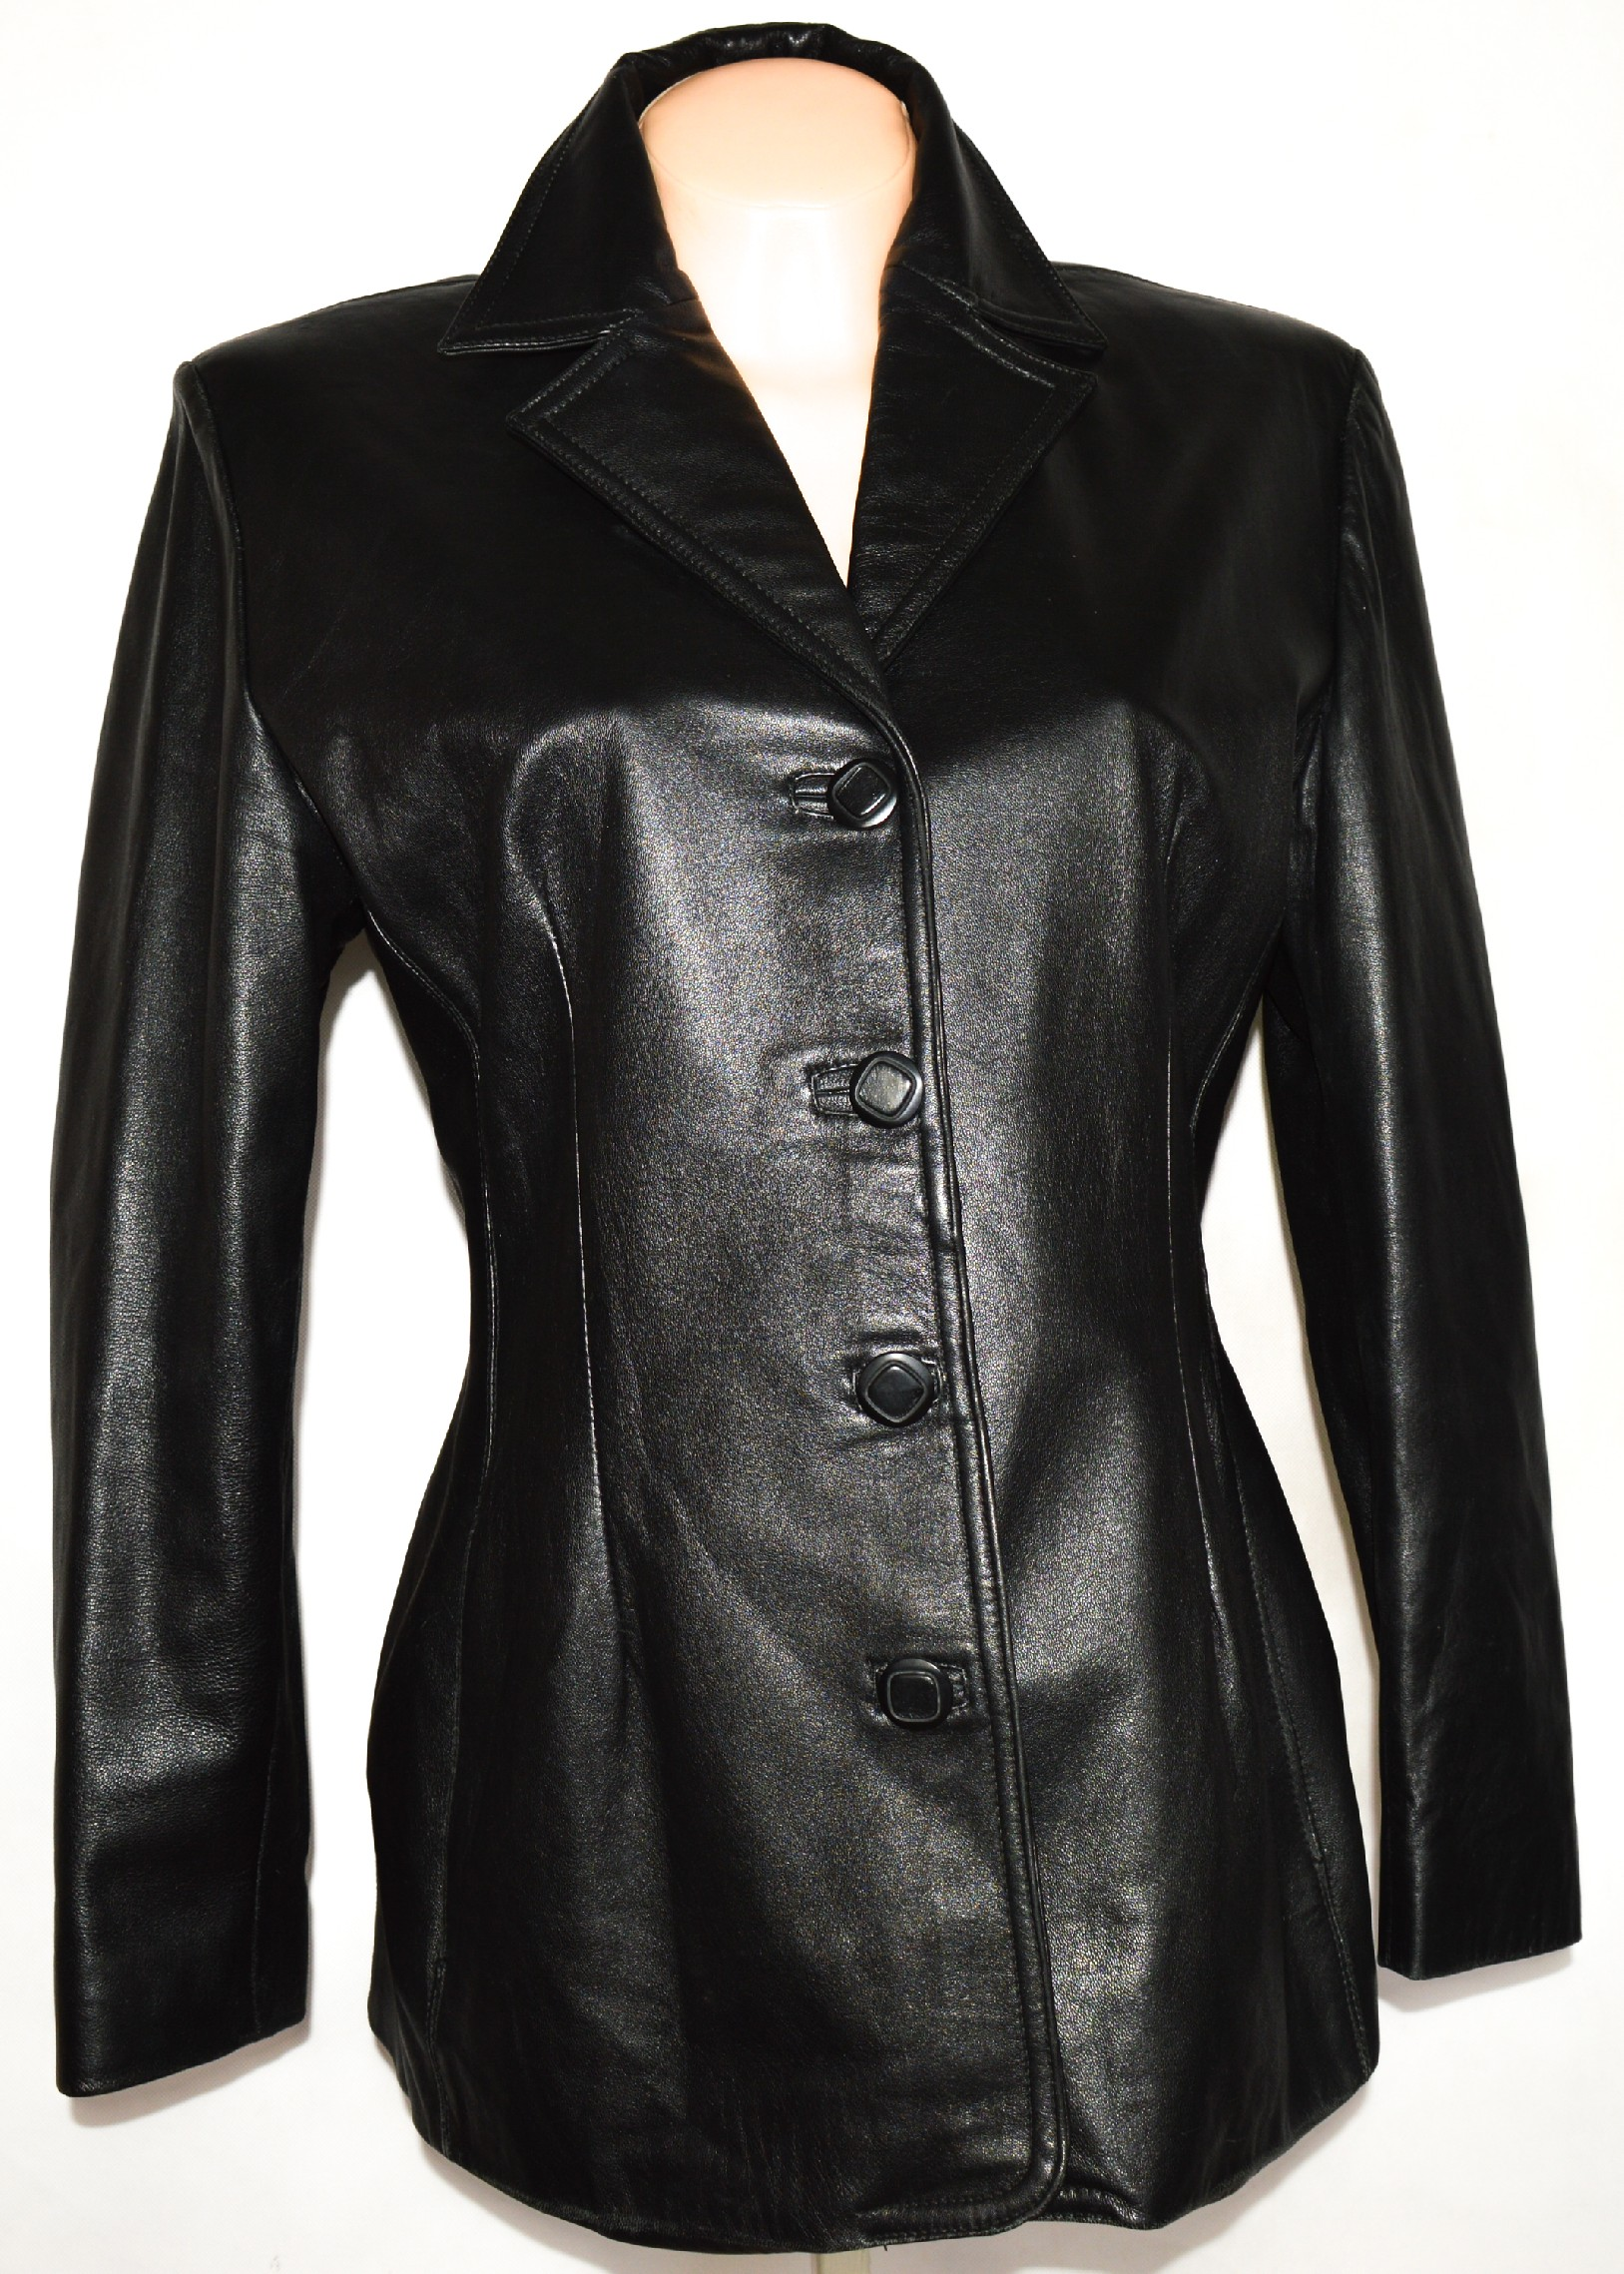 KOŽENÝ dámský měkký černý kabátek VERA PELLE L